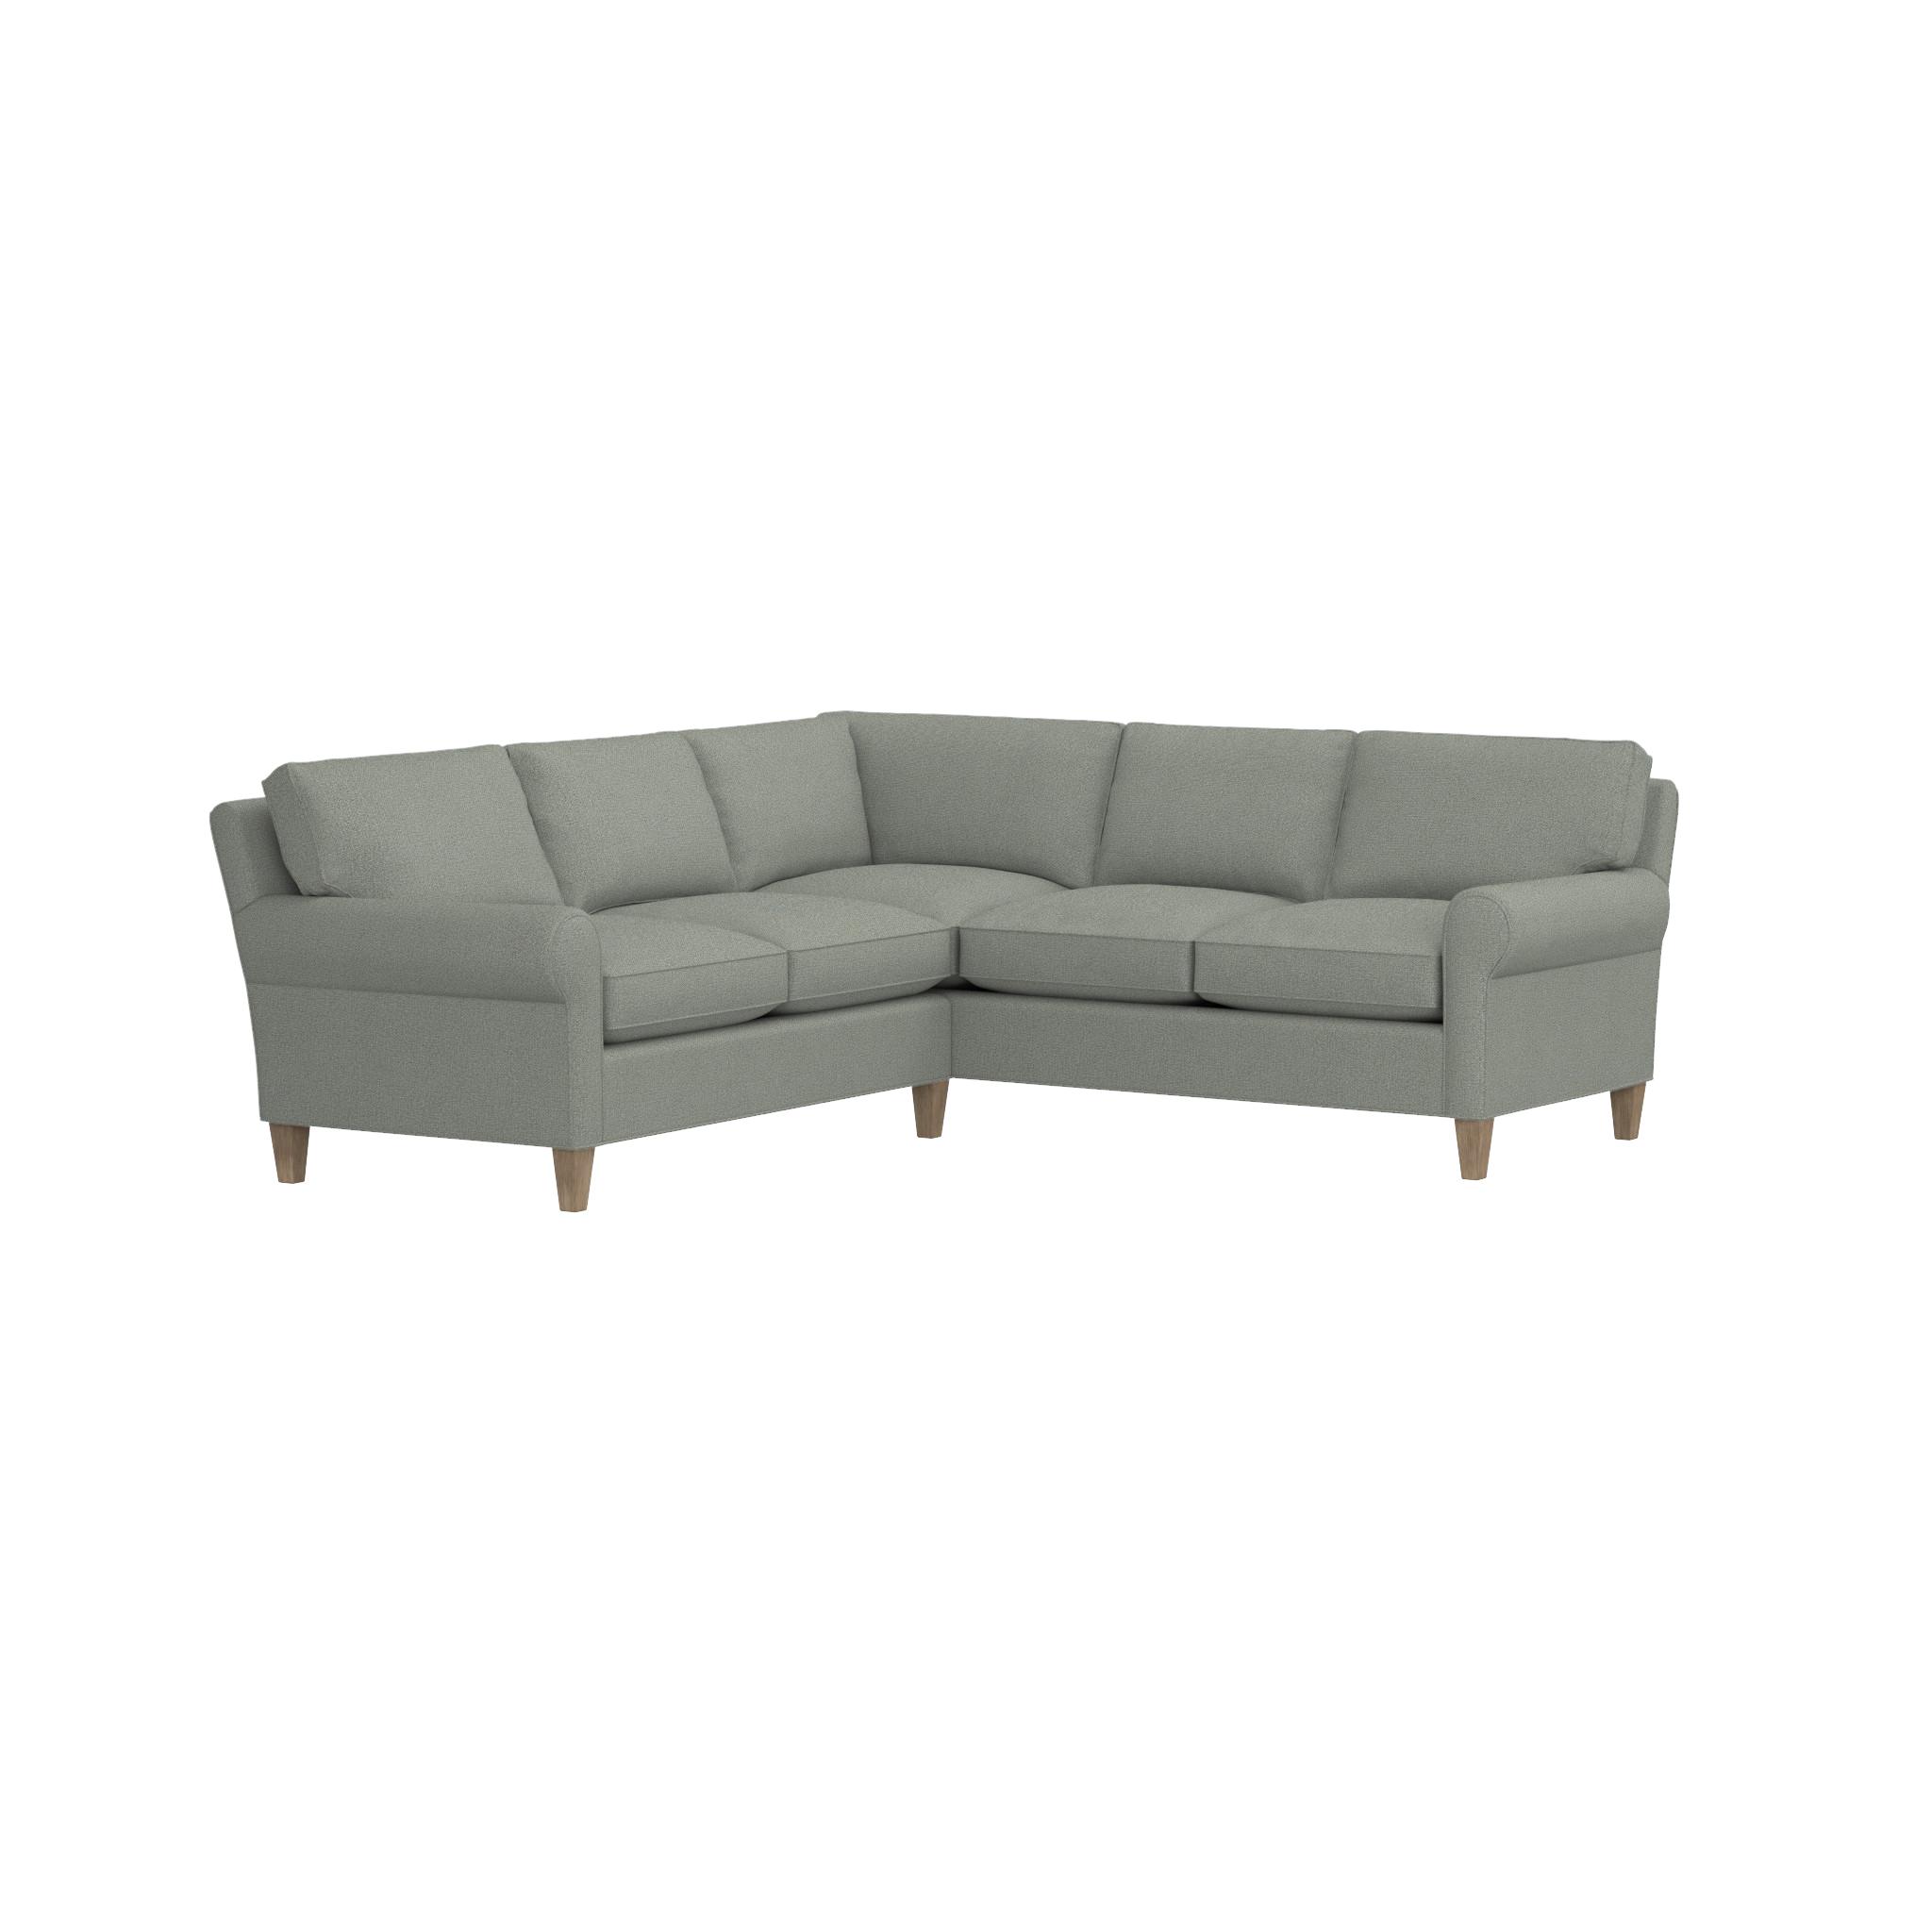 Shop montclair 2 piece sectional sofa